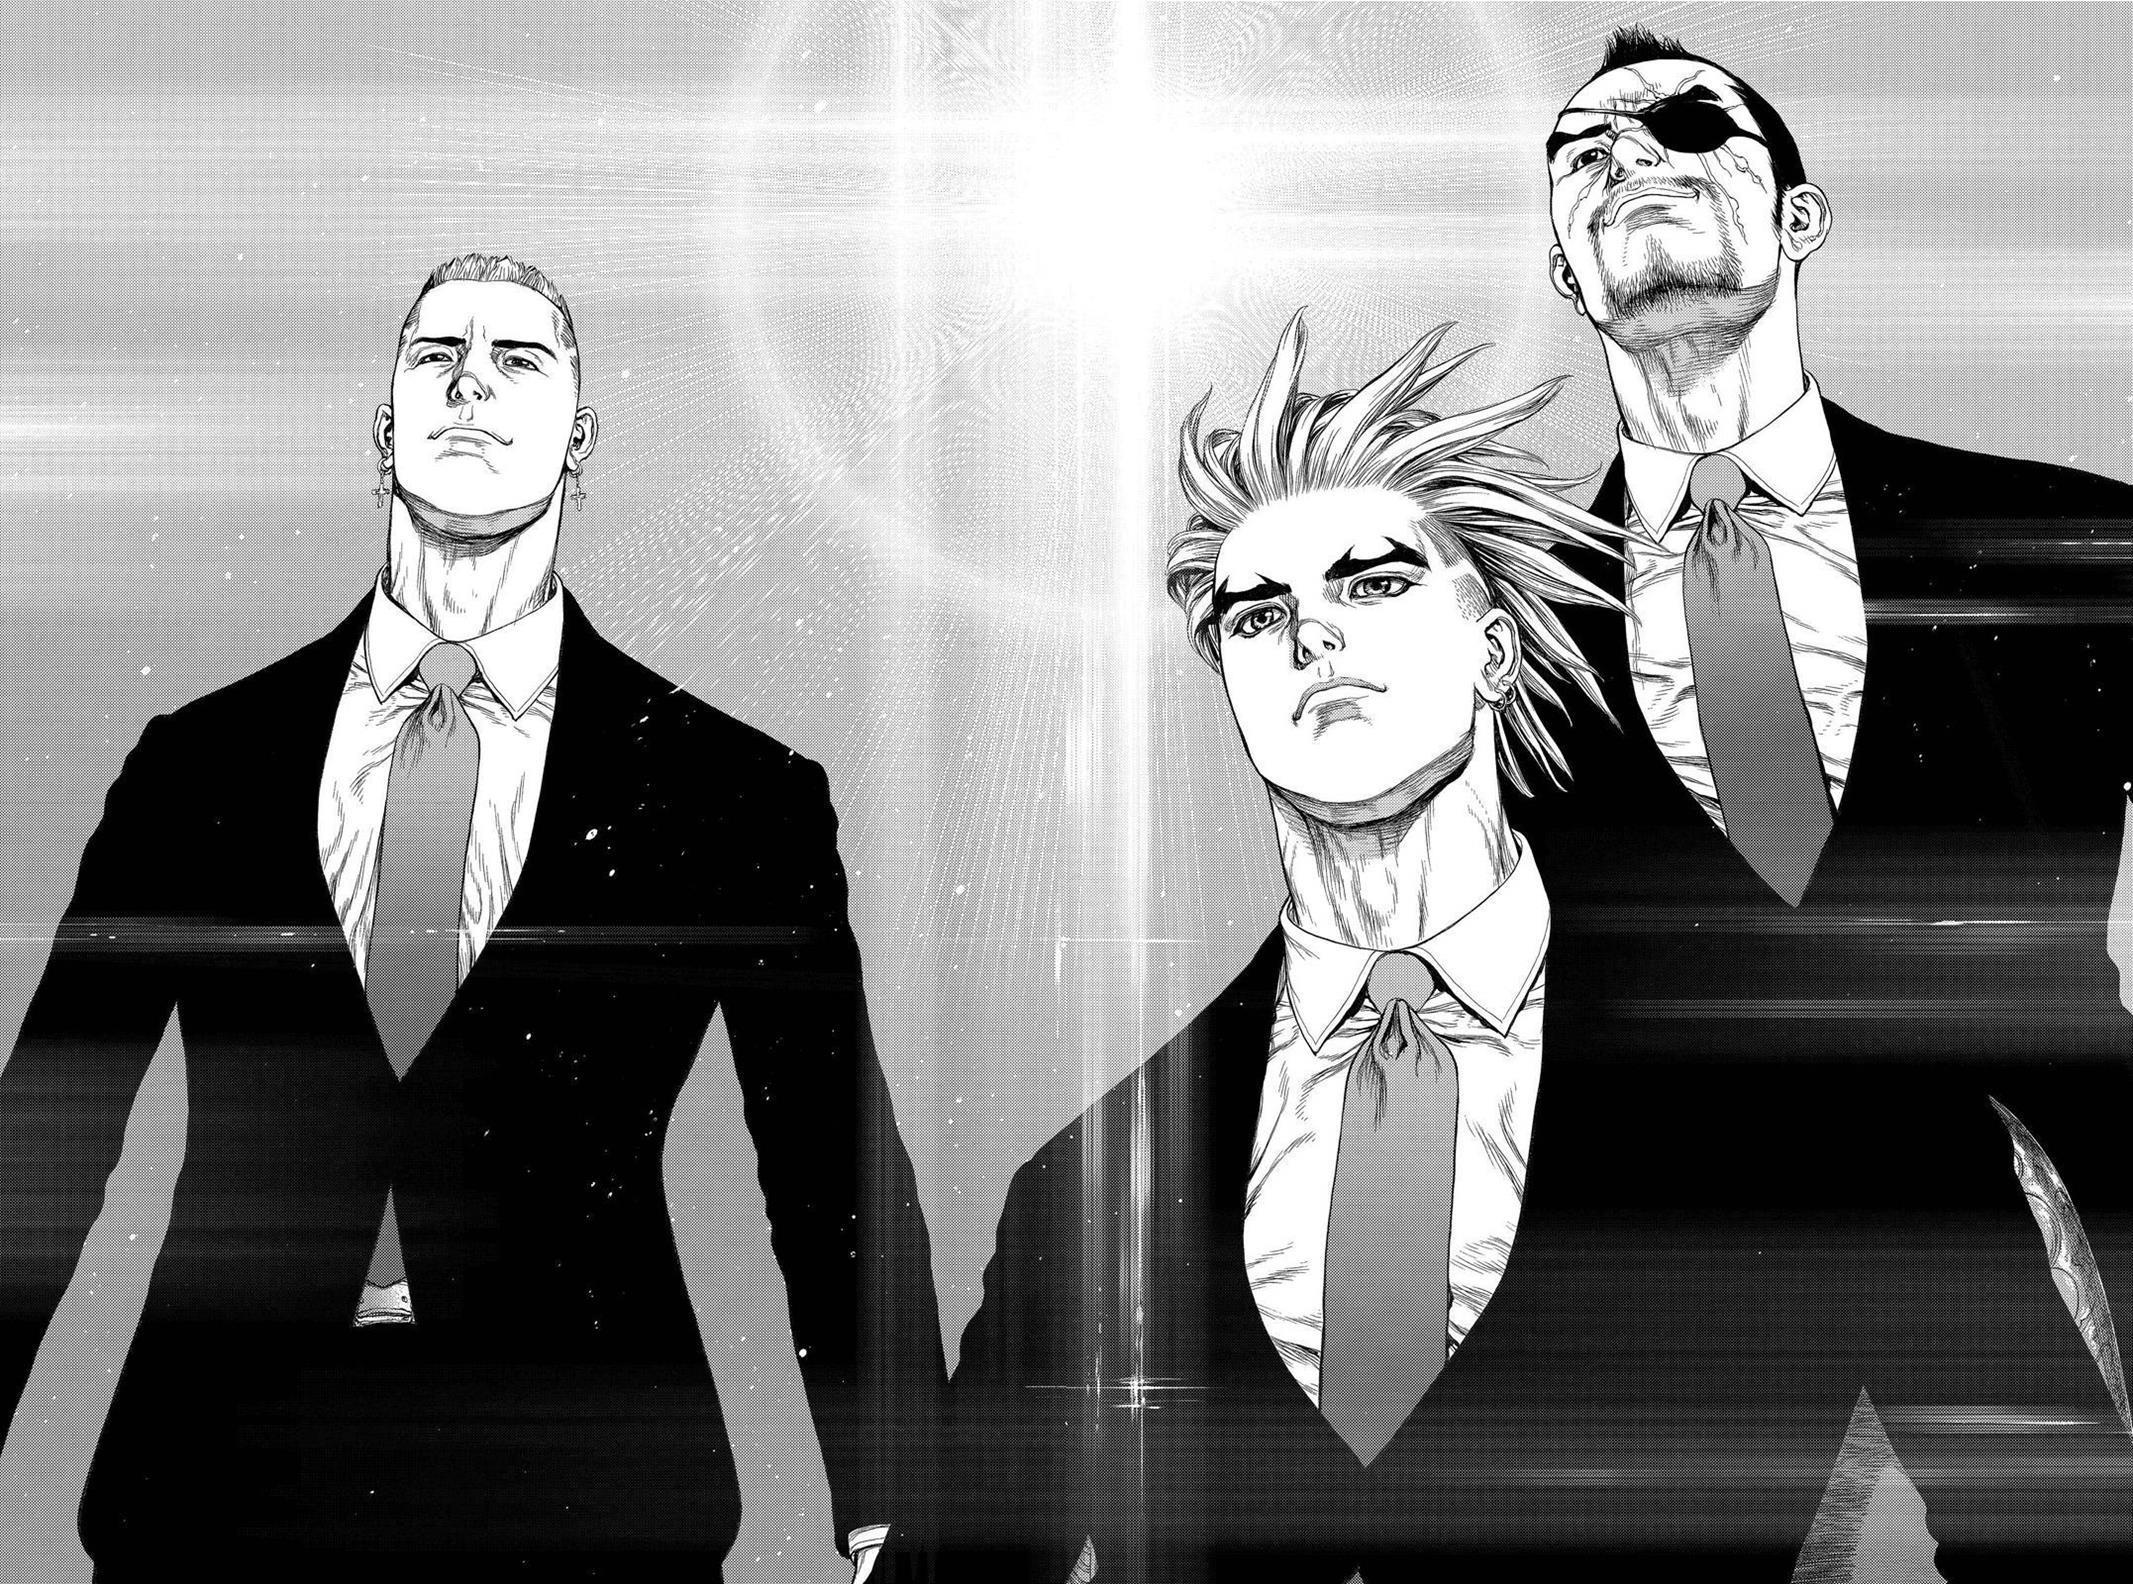 Anime 2133x1584 Sun Ken Rock manga anime boys anime men monochrome